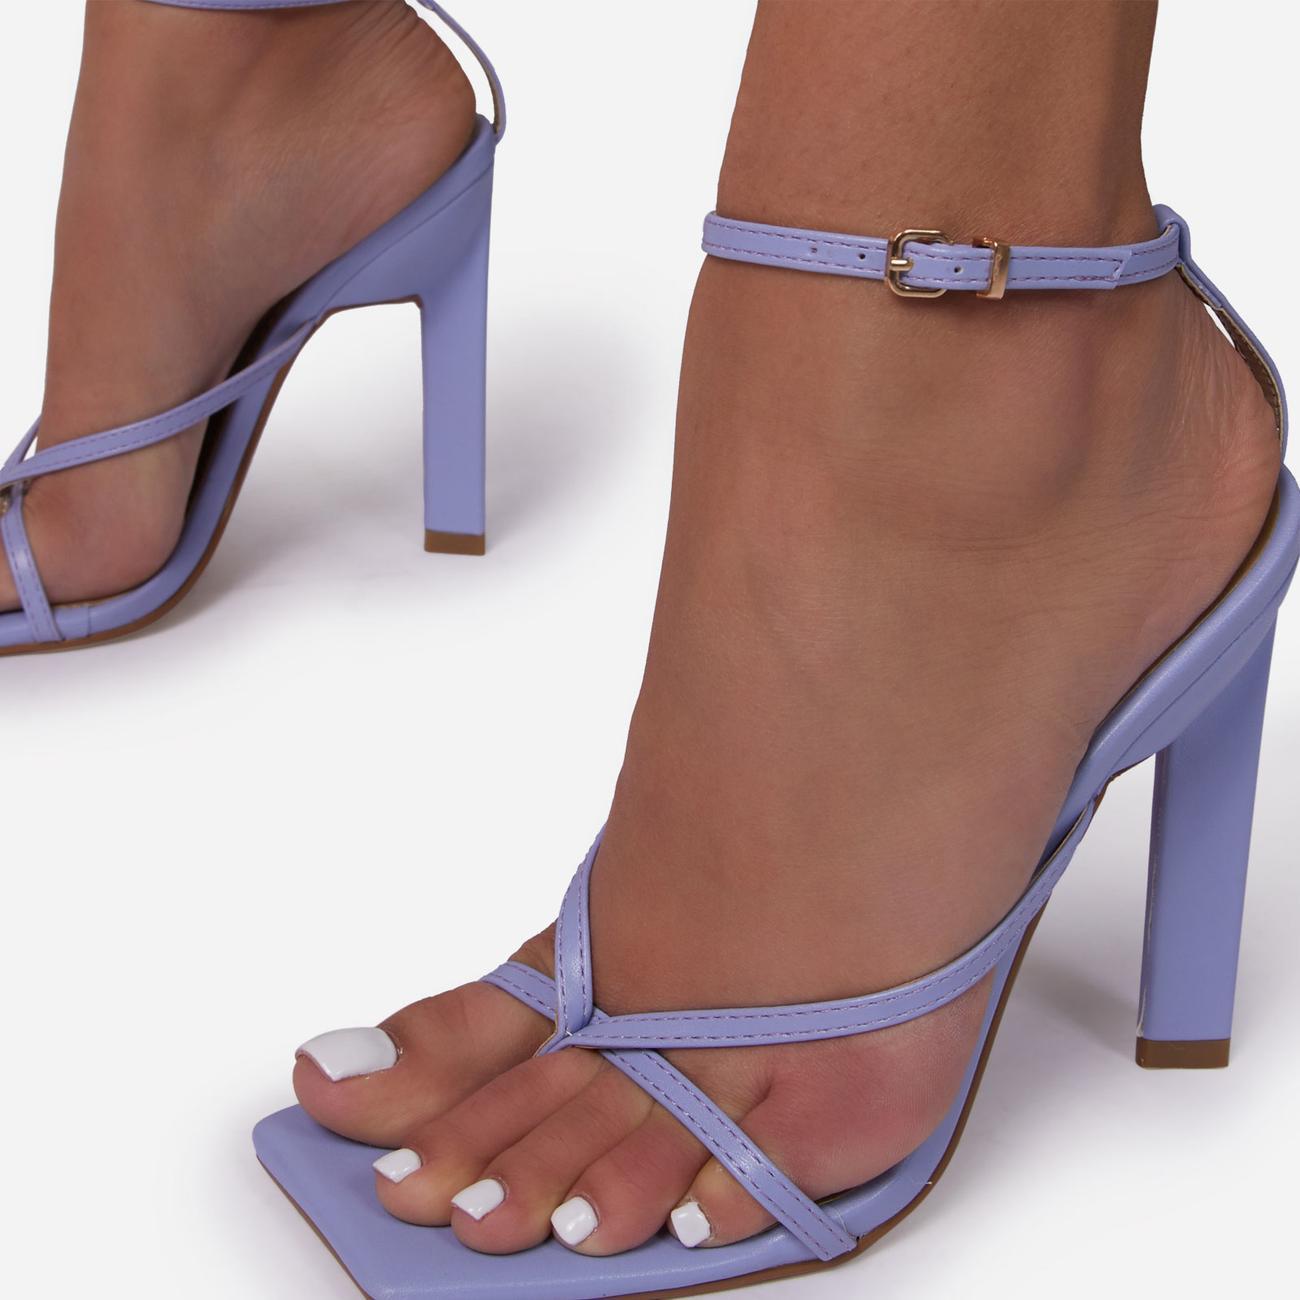 Enlighten Criss Cross Square Toe Sculptured Block Heel In Lilac Faux Leather Image 2